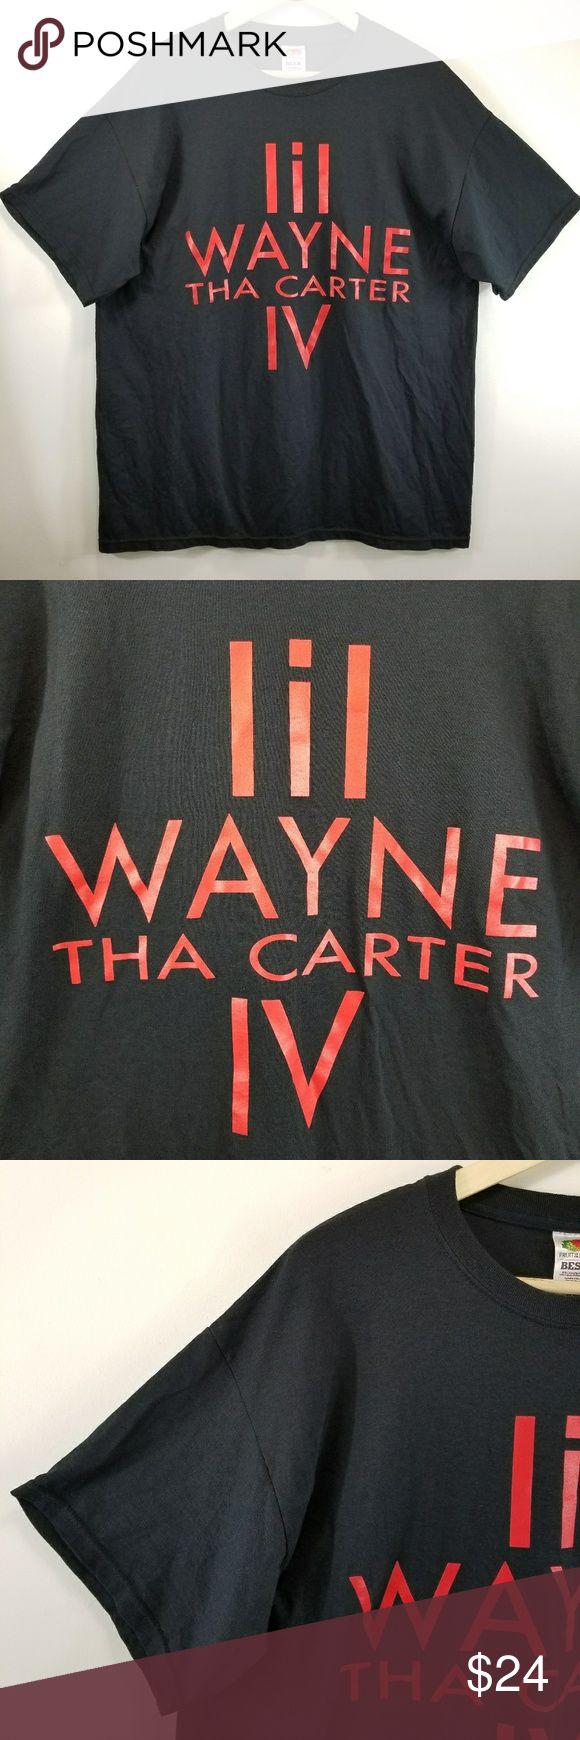 "Lil Wayne Tha Carter IV Hip Hop Rap T-Shirt YMCMB Lil Wayne Tha Carter IV T-shirt YMCMB Young Money Cash Money Billionaire  8"" (20 cm) sleeve  50"" (127 cm) chest 31"" (79 cm) back of neck to bottom hem Hanes Shirts Tees - Short Sleeve"